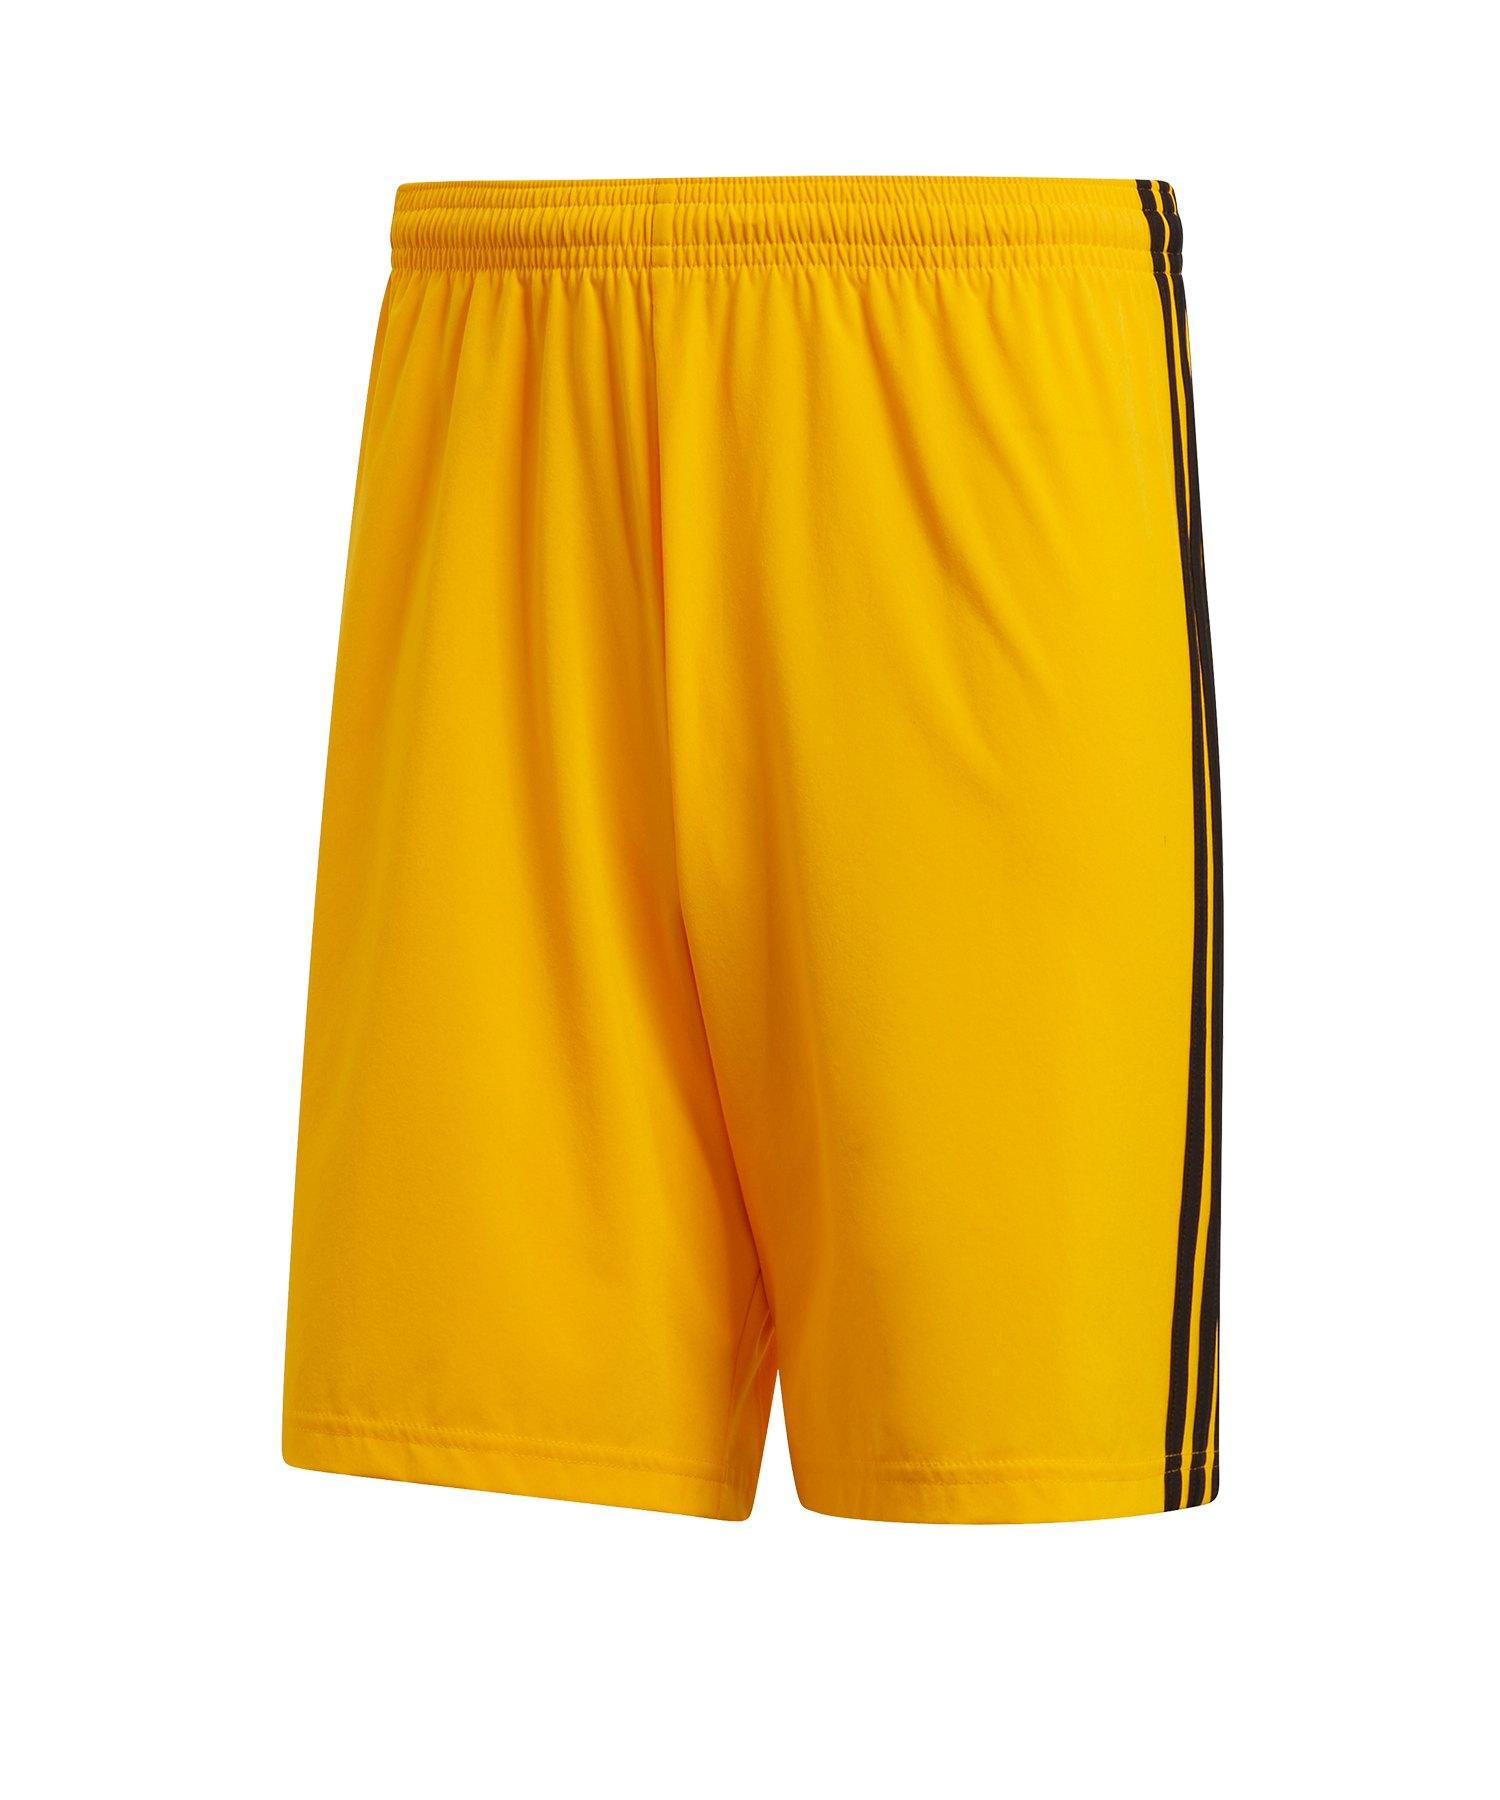 adidas Condivo 18 Short Hose kurz Kids Gold - gold